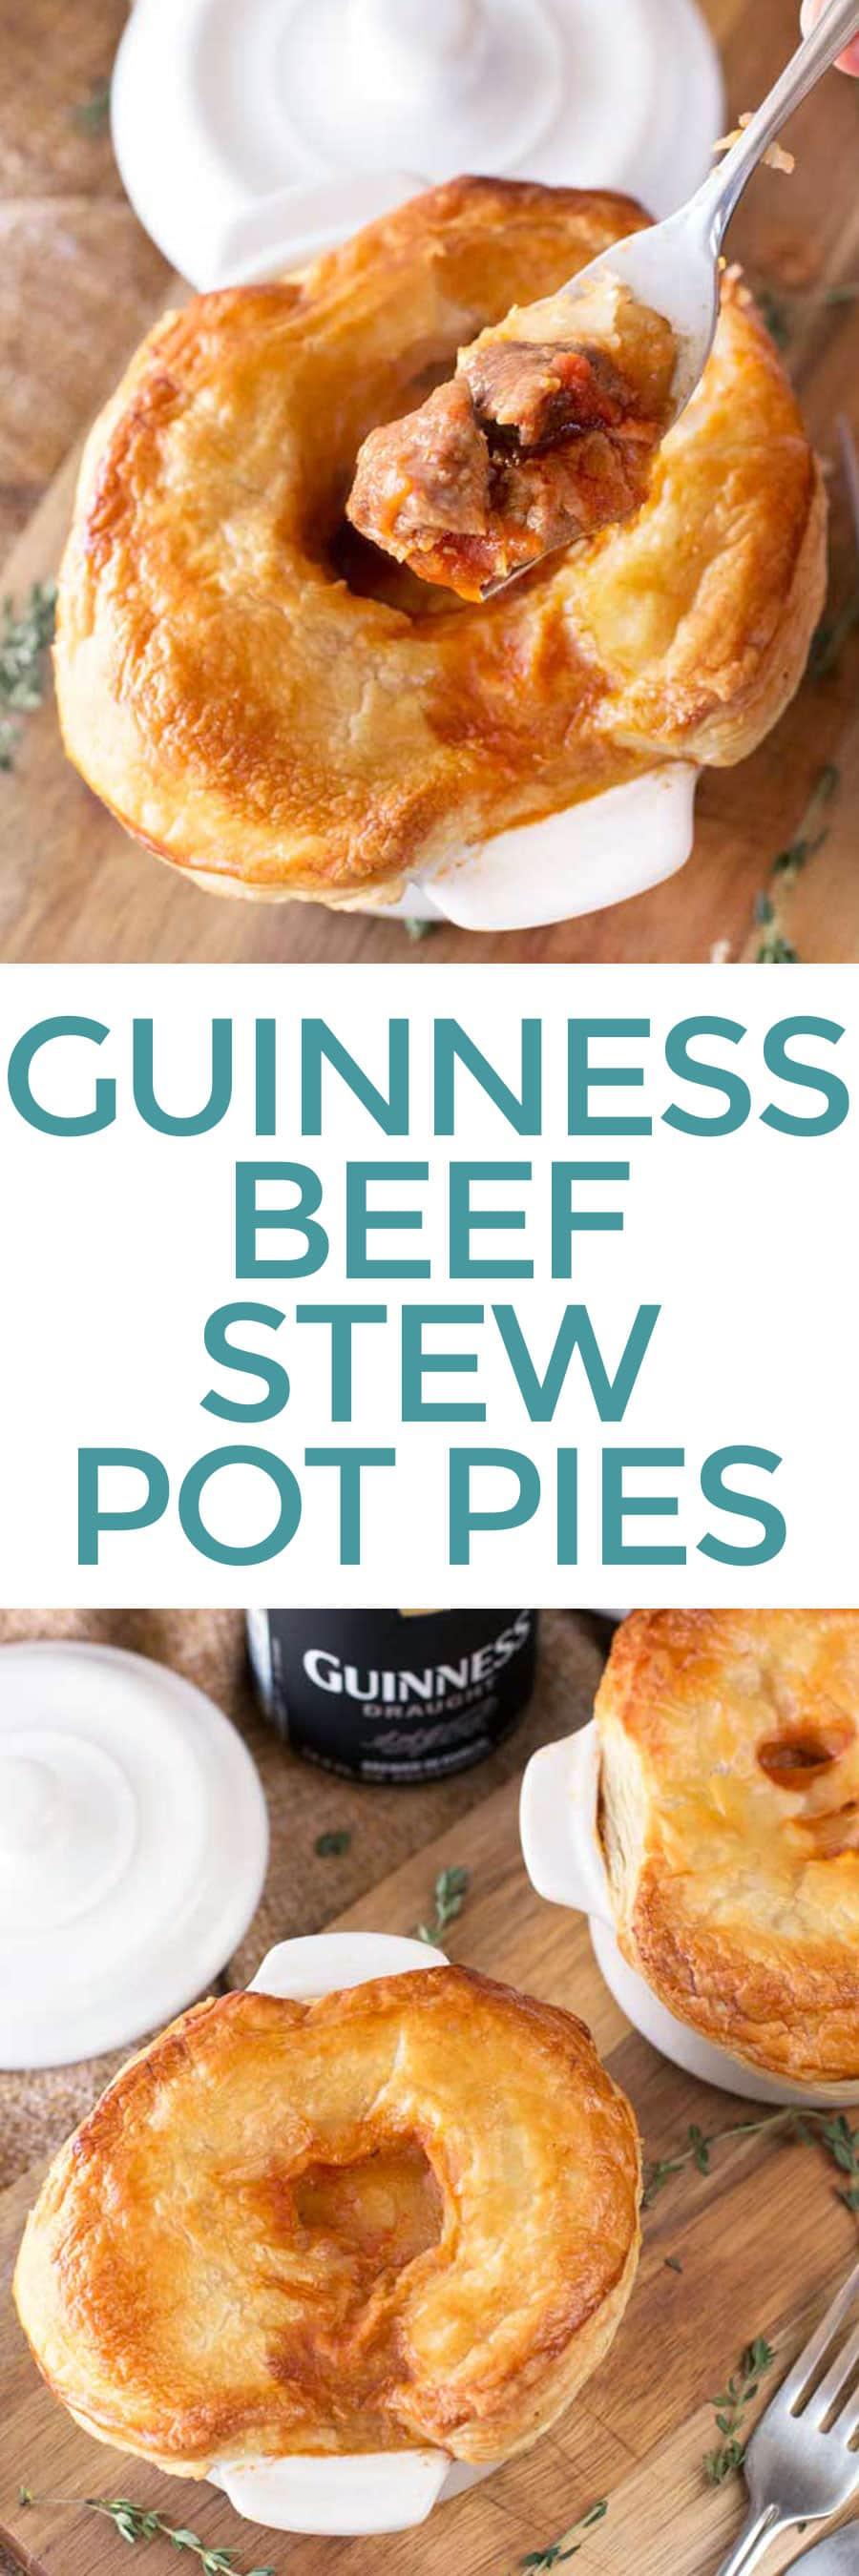 Guinness Beef Stew Pot Pies | cakenknife.com #appetizer #beef #snack #stpatricksday